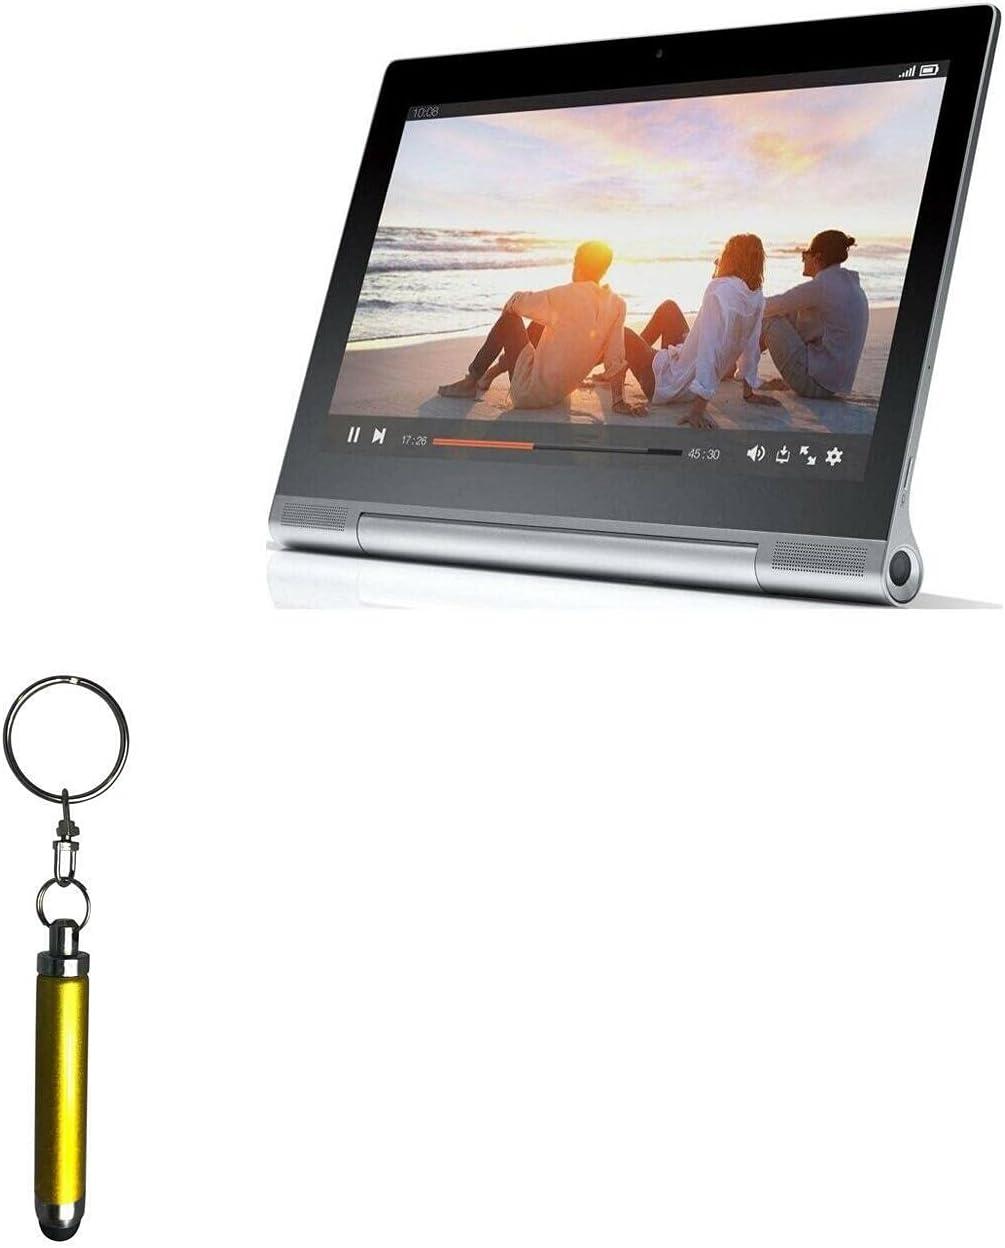 Stylus Pen for Lenovo Yoga Tablet 2 Pro (Stylus Pen by BoxWave) - Bullet Capacitive Stylus, Mini Stylus Pen with Keyring Loop for Lenovo Yoga Tablet 2 Pro - Bronze